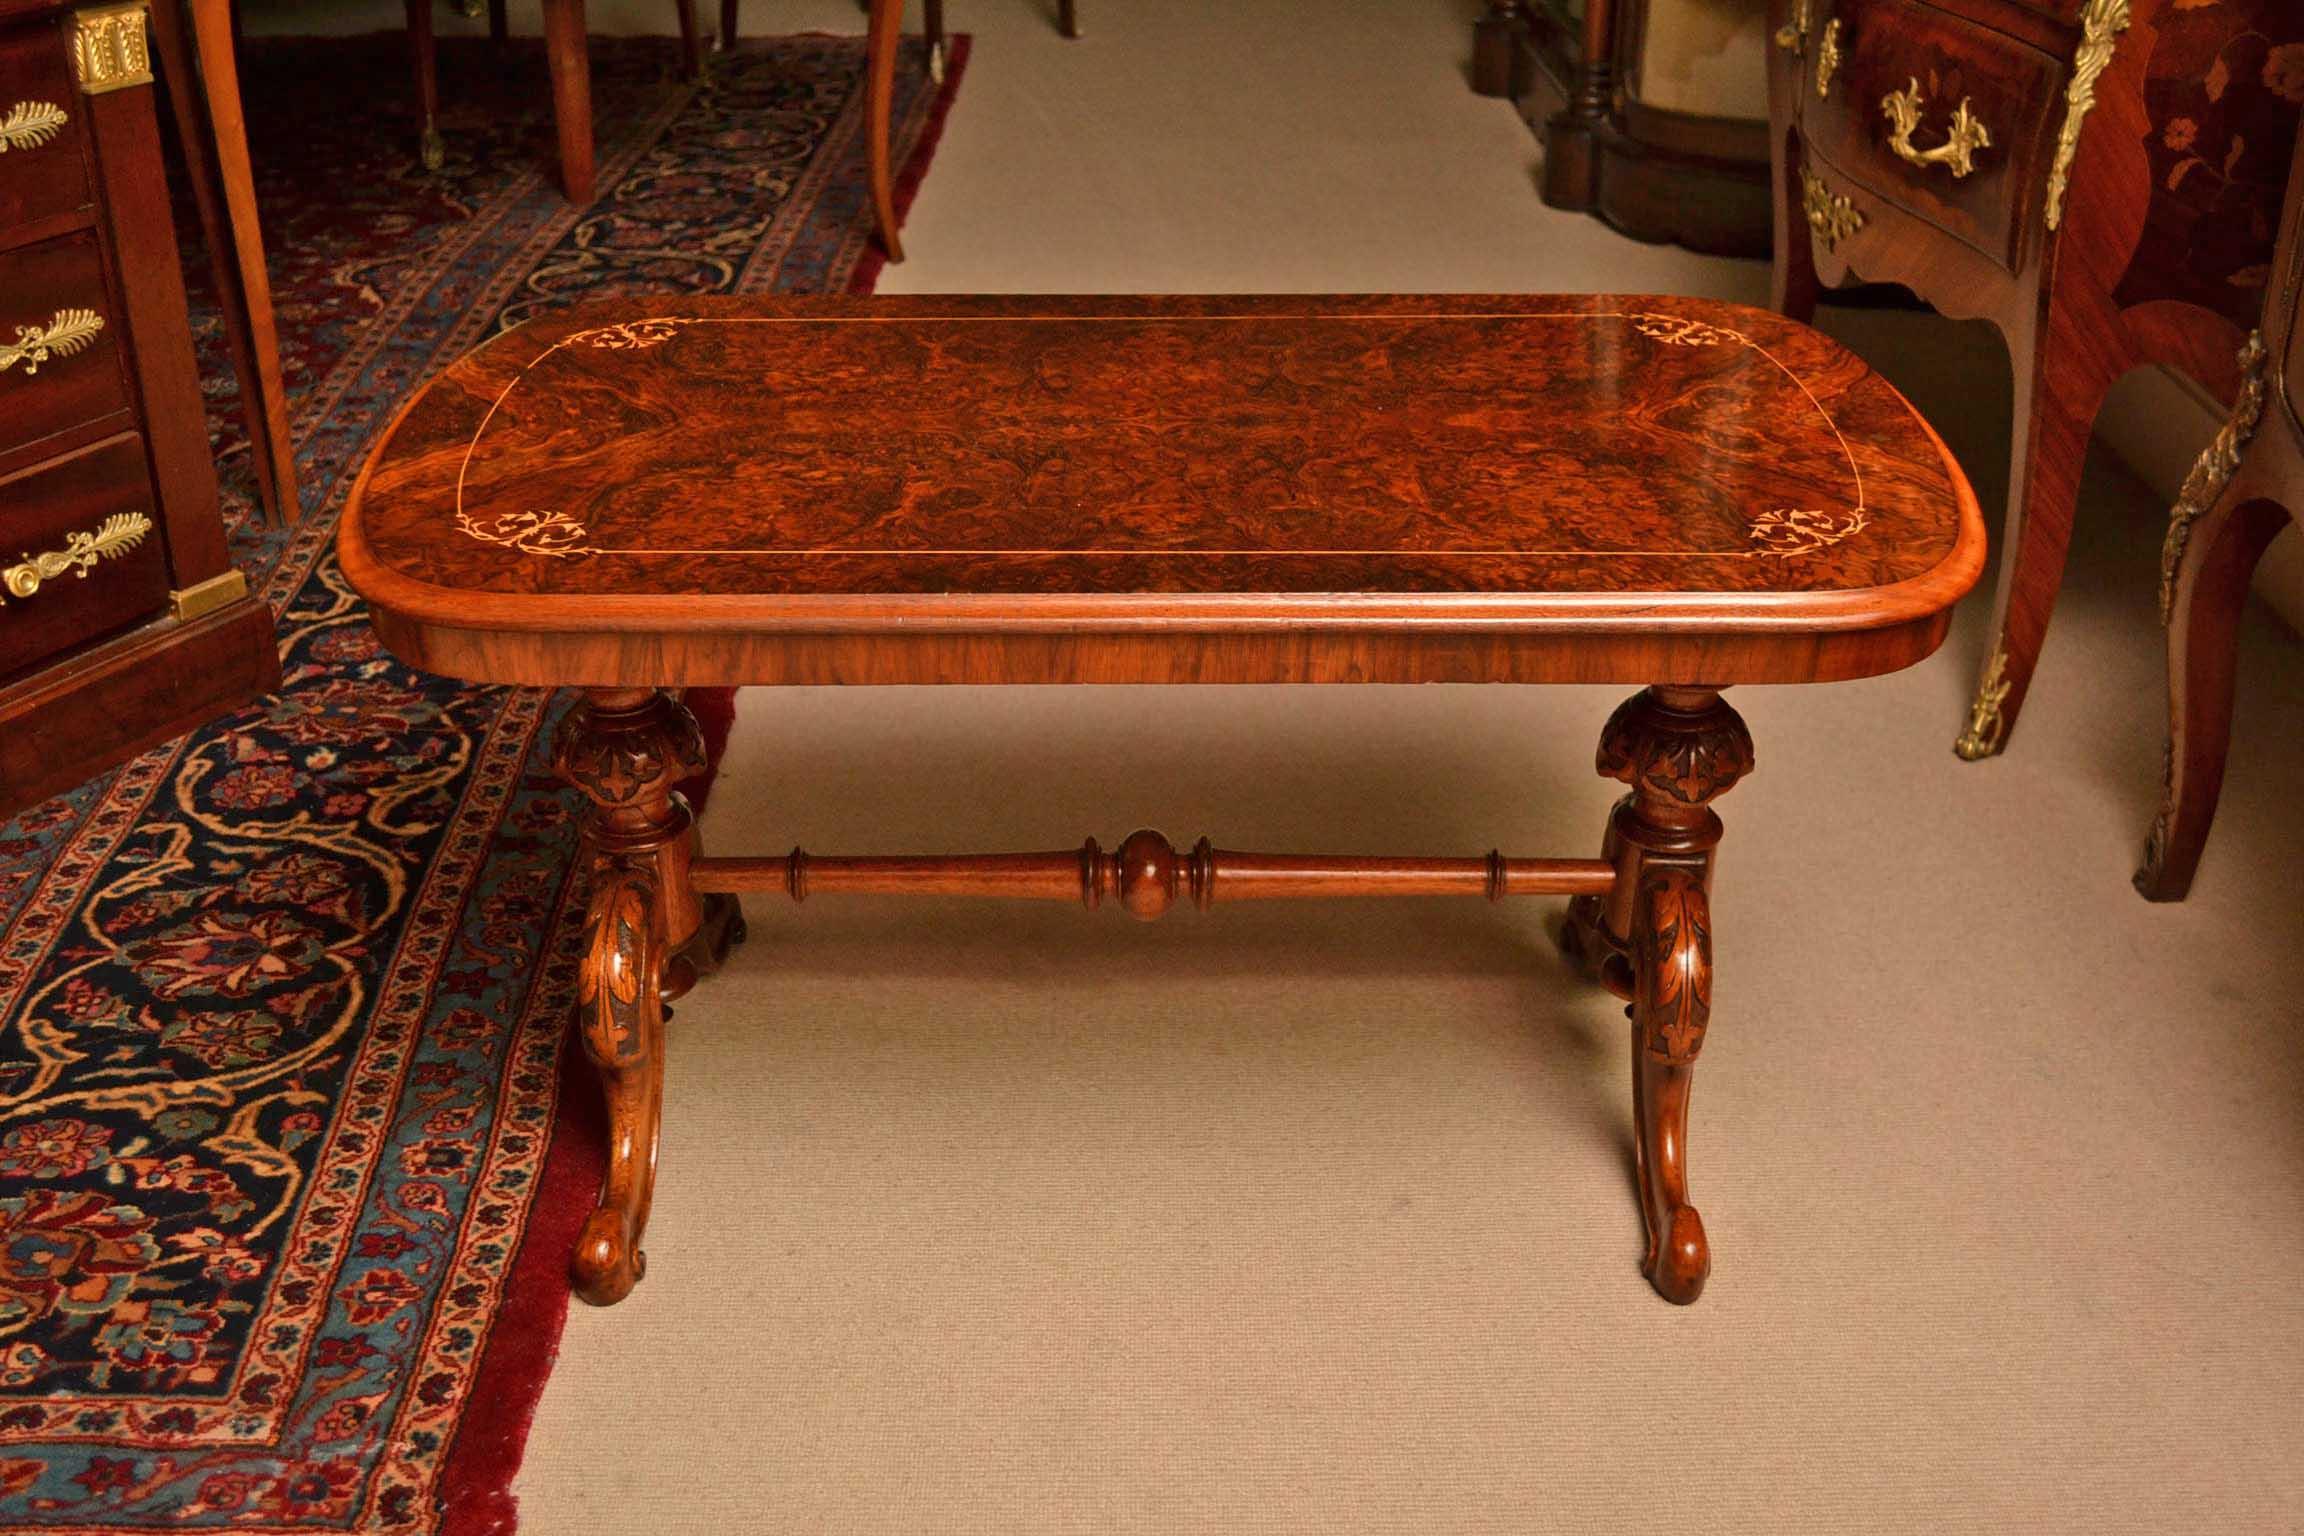 Antique Victorian Cabriole Burr Walnut Coffee Table